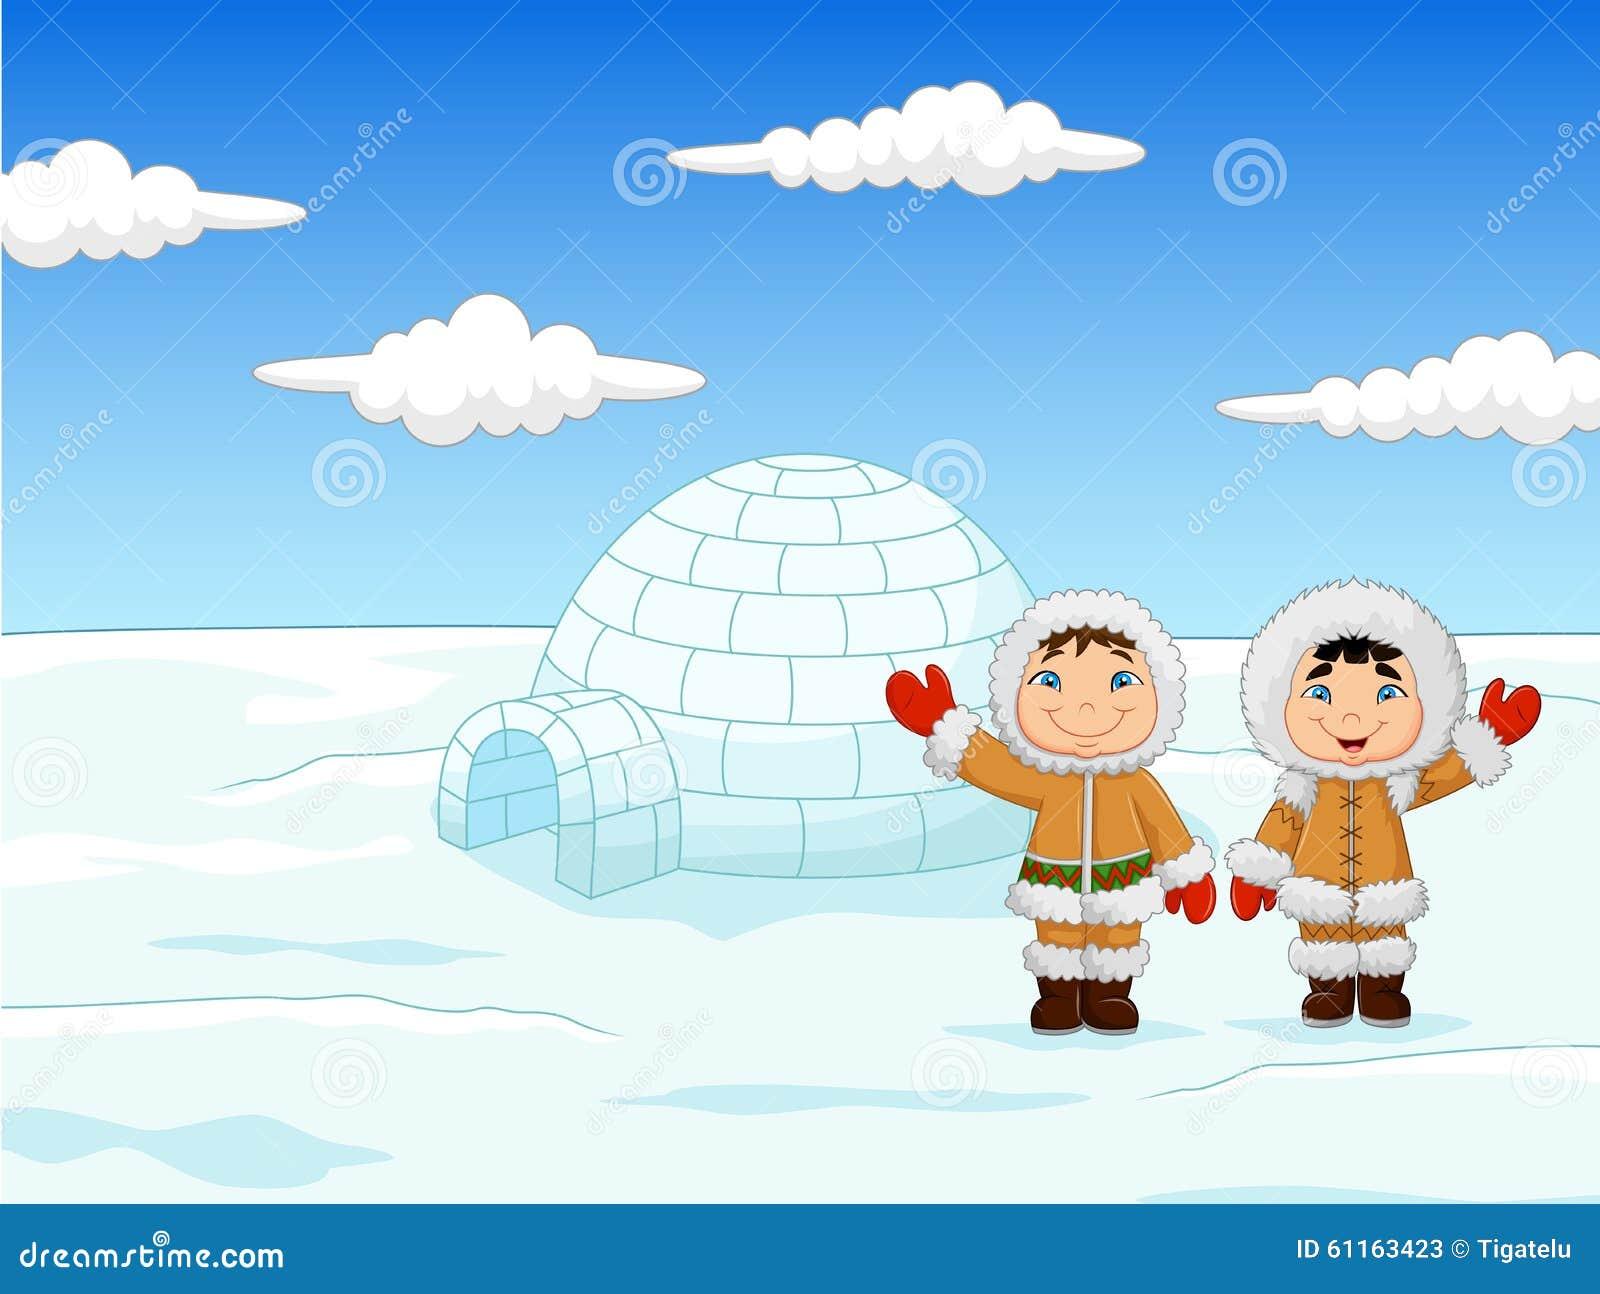 Stock Illustration Little Kids Wearing Traditional Eskimo Costume Igloo House Illustration Image61163423 on 24 X 32 House Plans